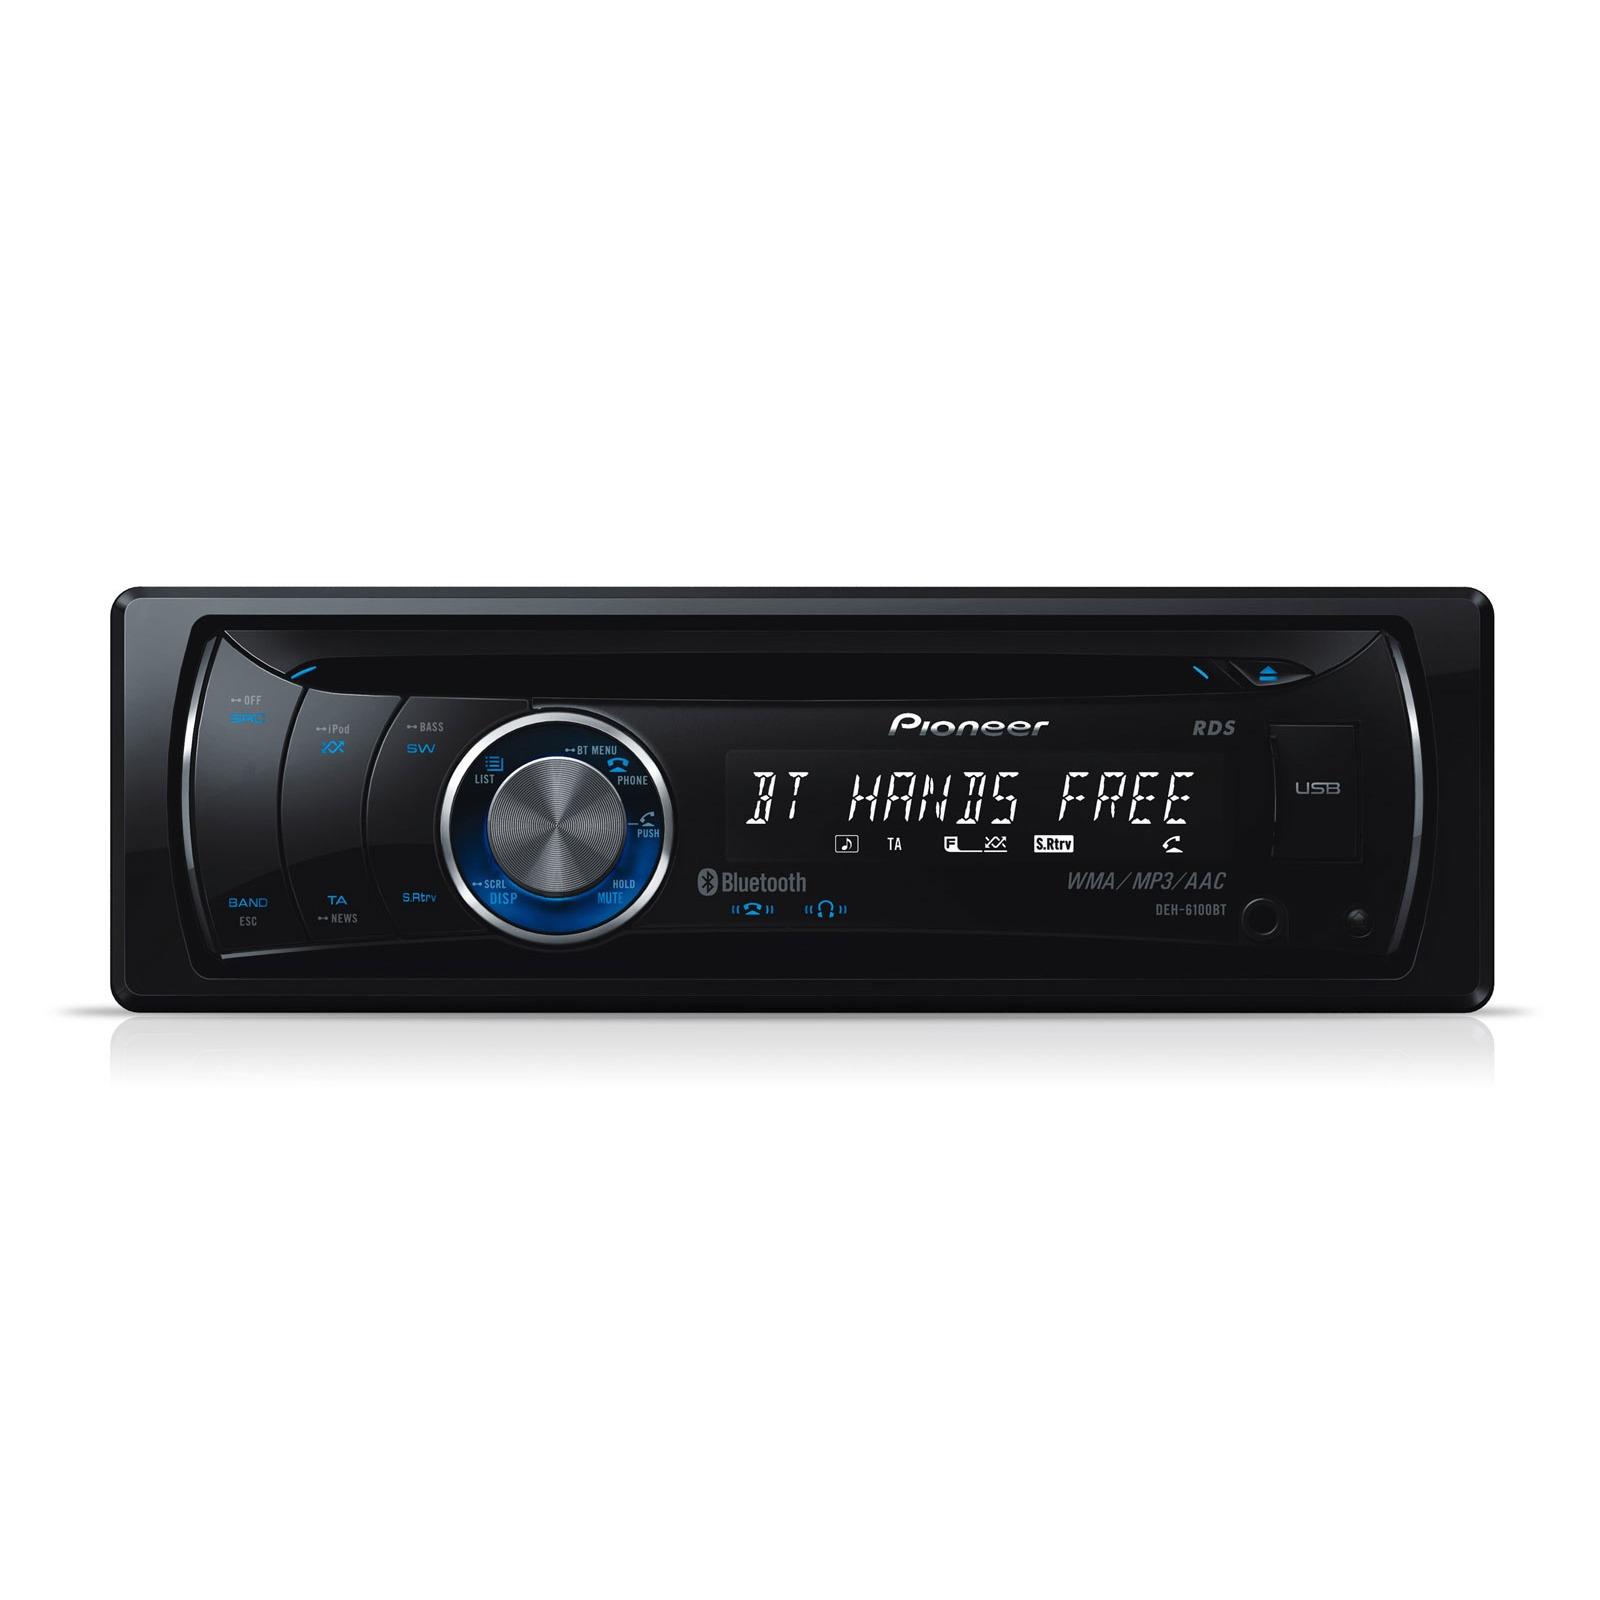 Autoradio Pioneer DEH-6100BT Pioneer DEH-6100BT - Autoradio CD Bluetooth iPod avec port USB et entrée auxiliaire